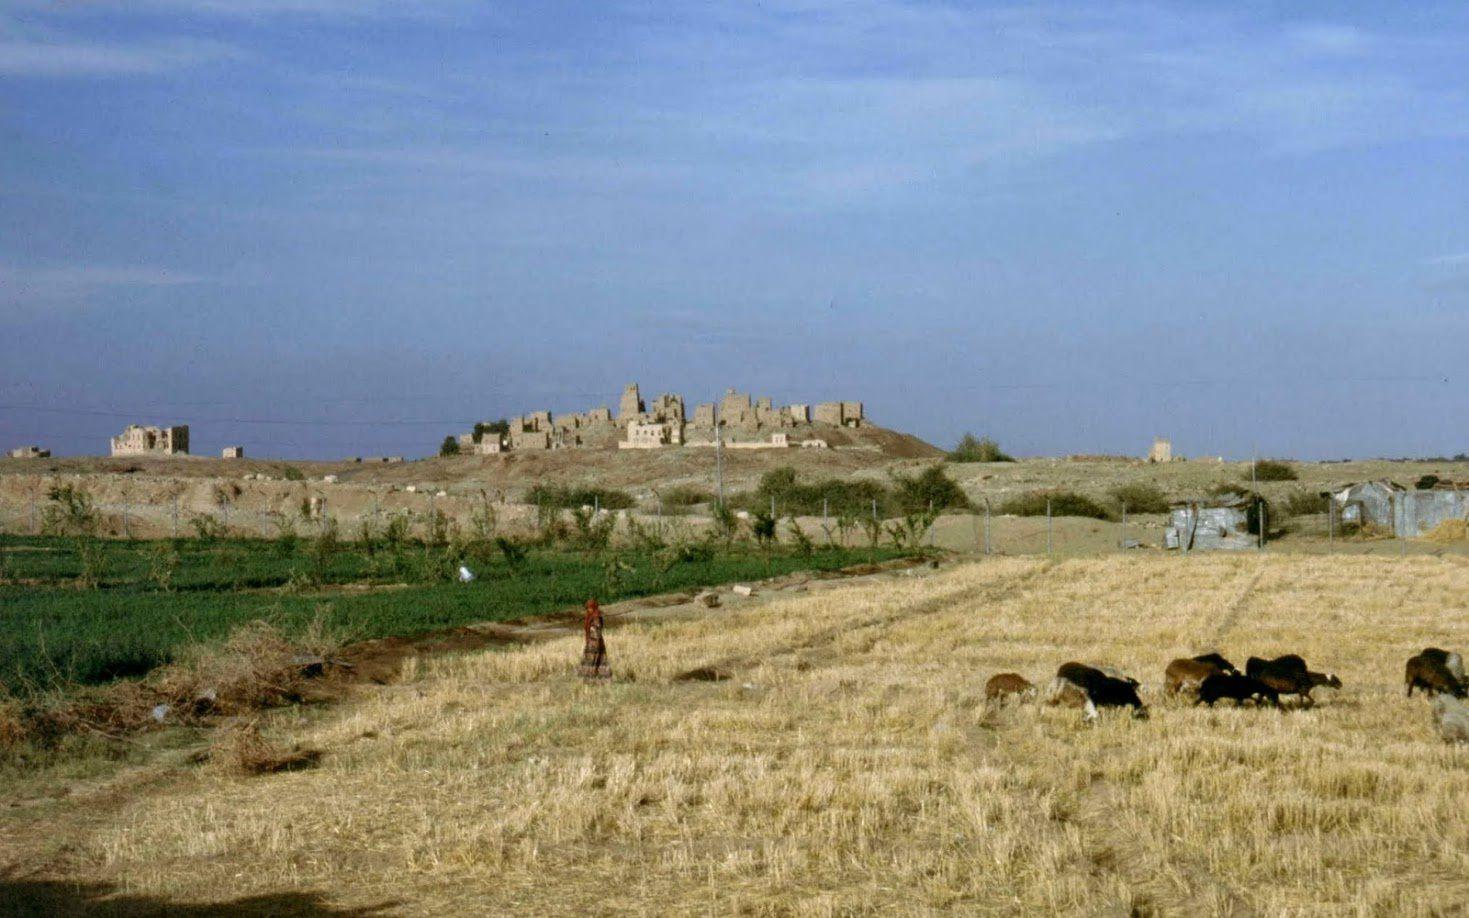 L'ancien village de Ma'rib bombardé par les Égyptiens durant la guerre